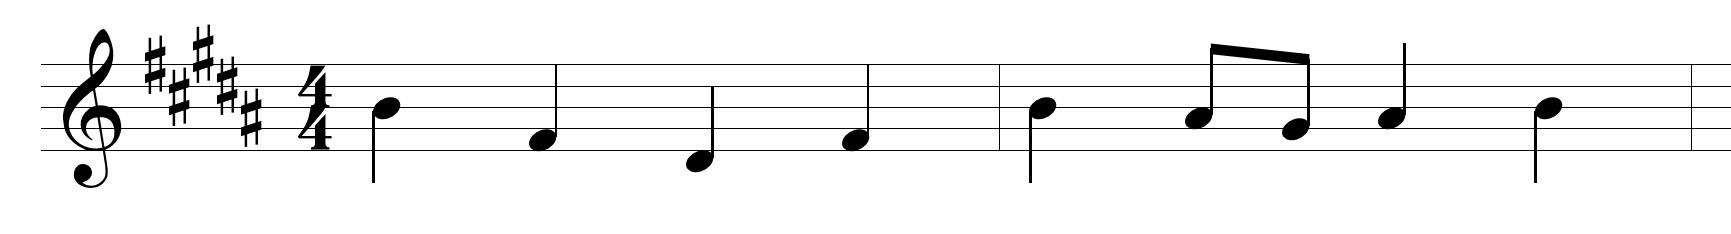 Kimberly Satre - Simple division (11).jpg